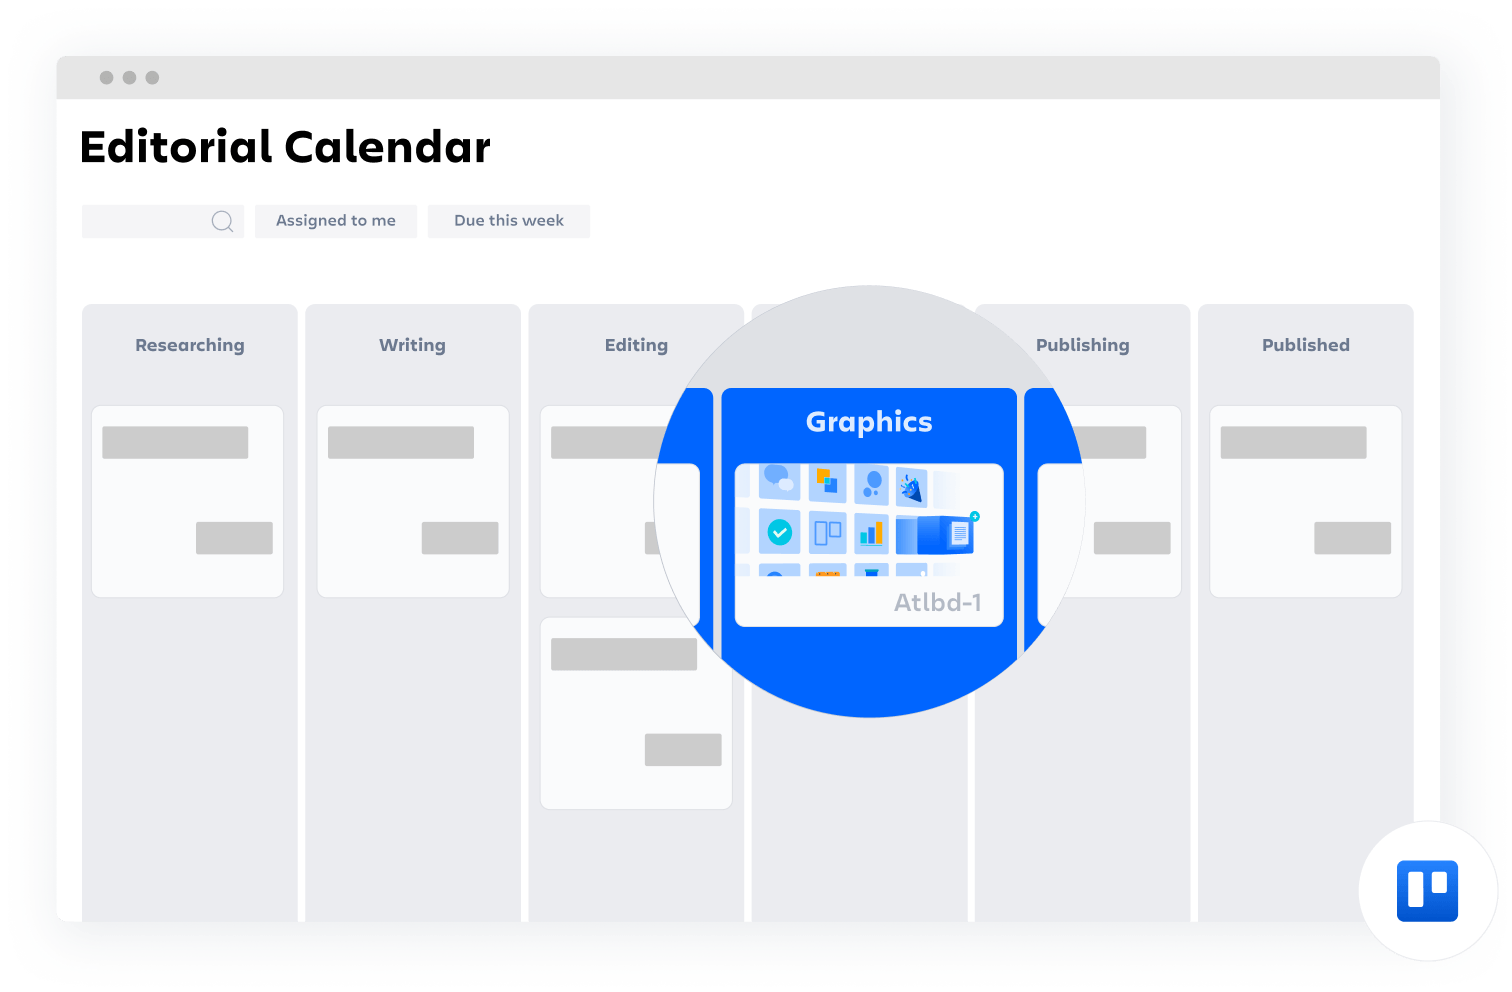 Kalendarz redakcyjny — szablon Confluence